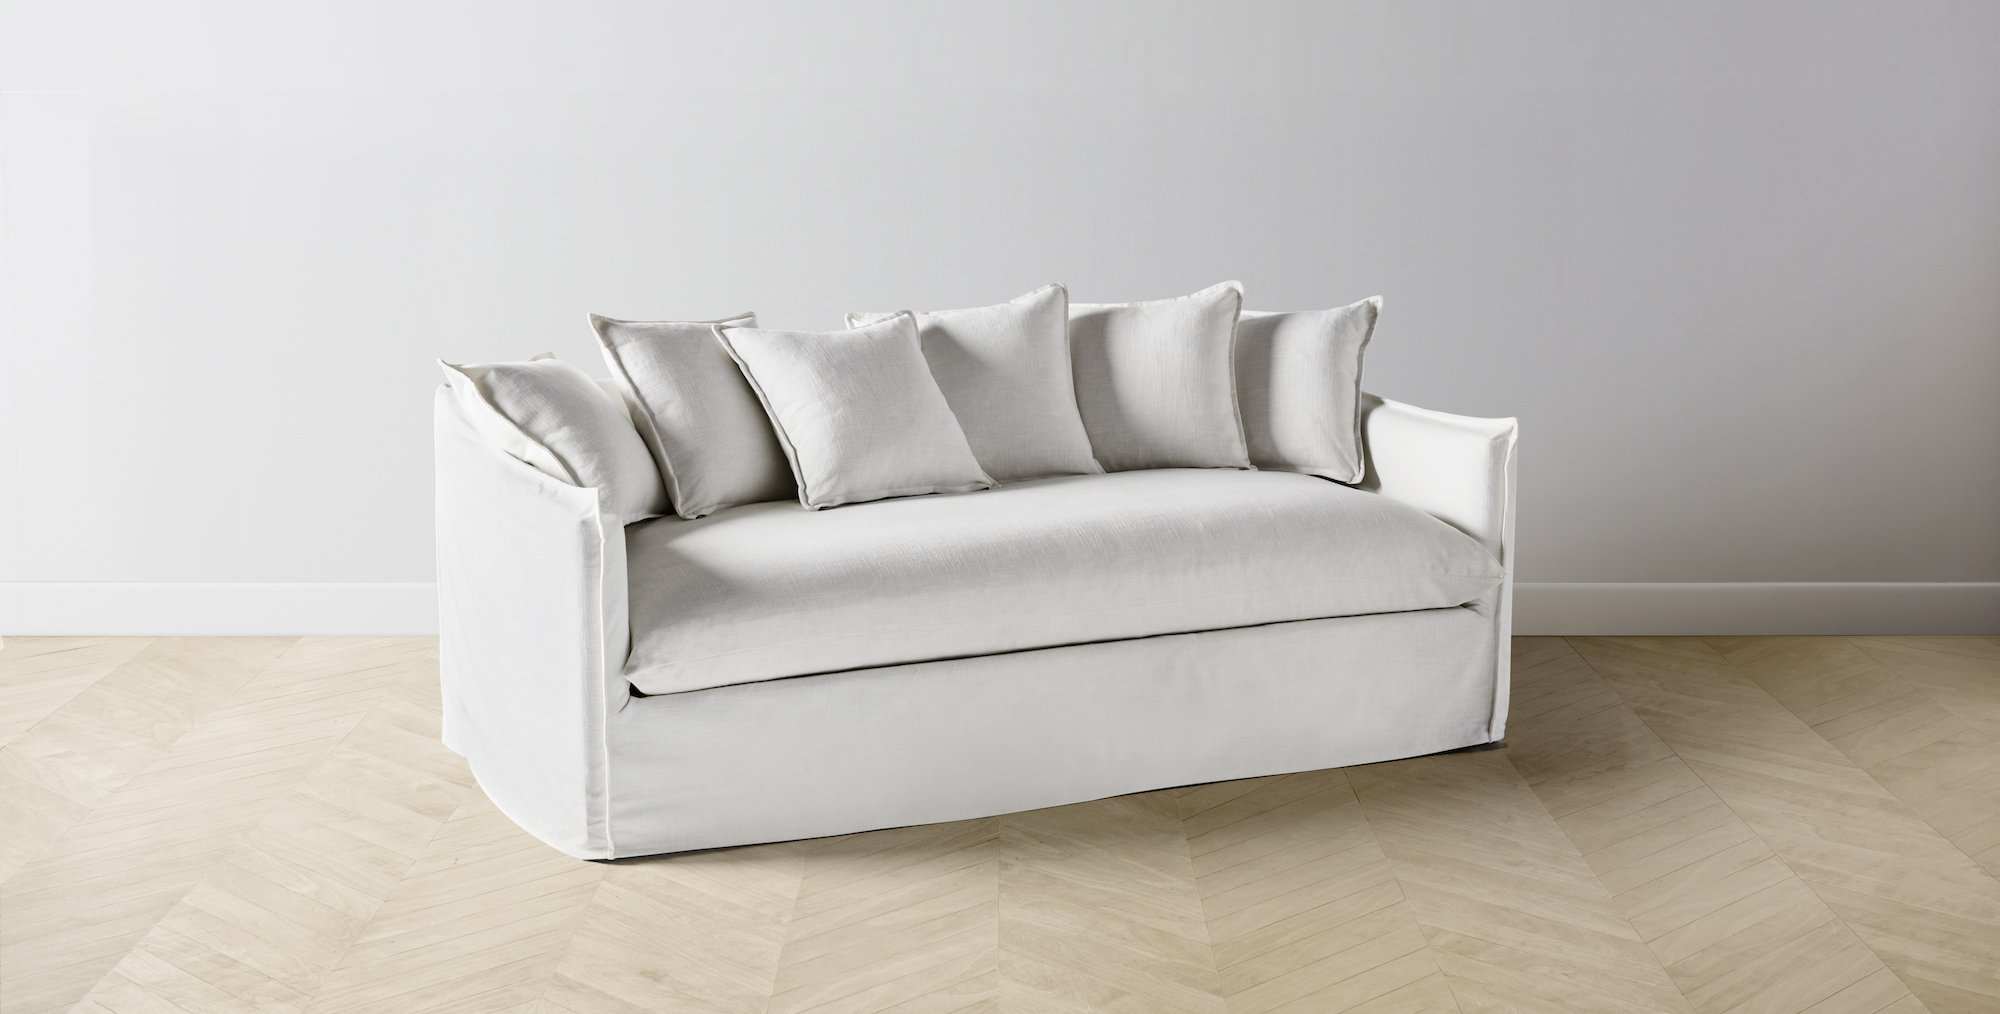 North Carolina Furniture - Maiden Home